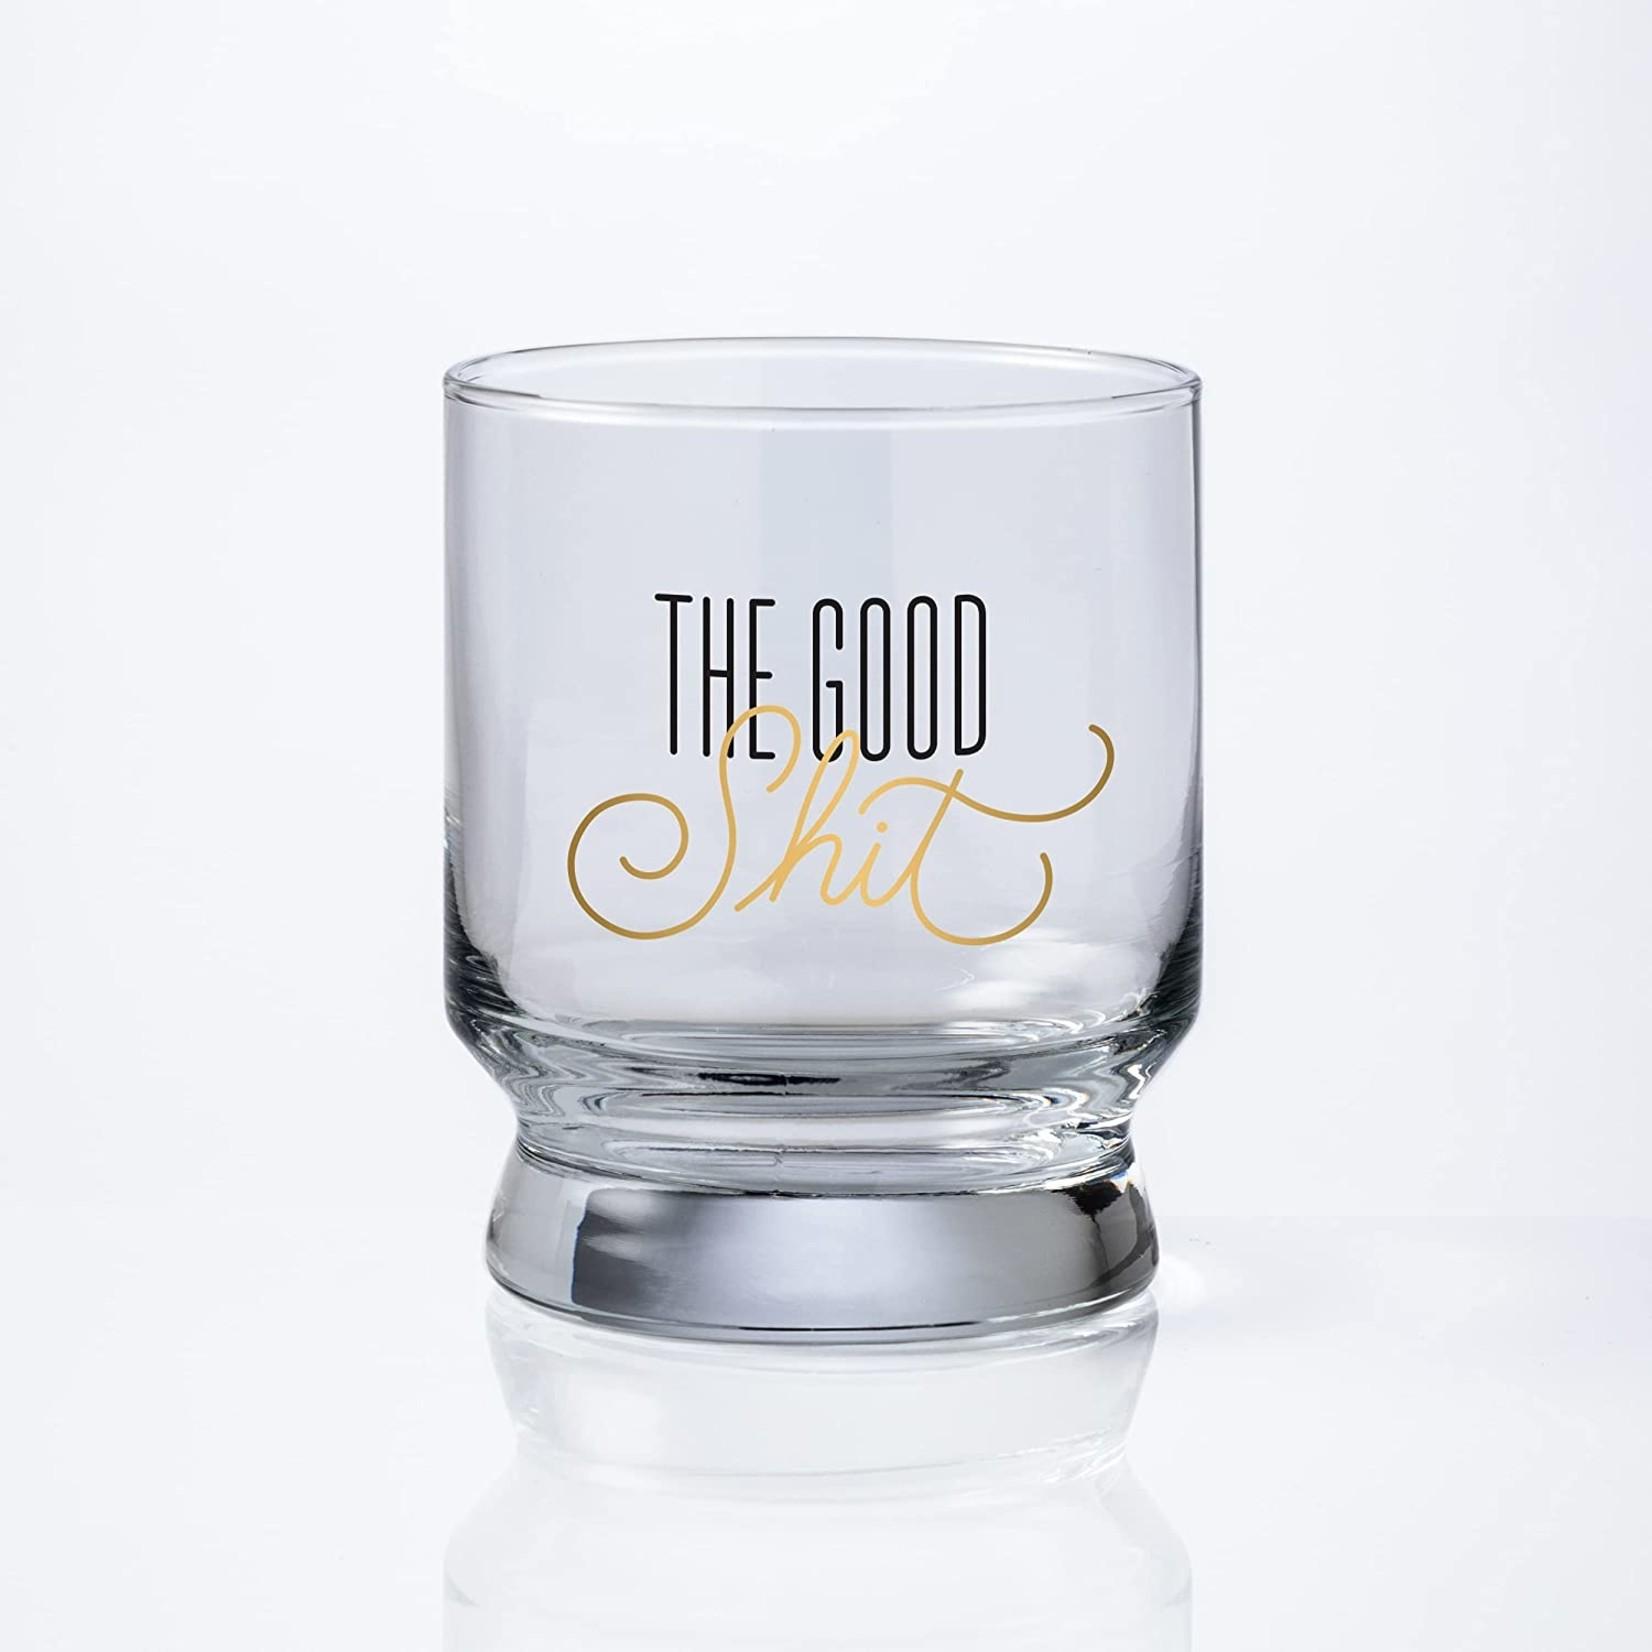 The Good Sh*t Lowball Glass